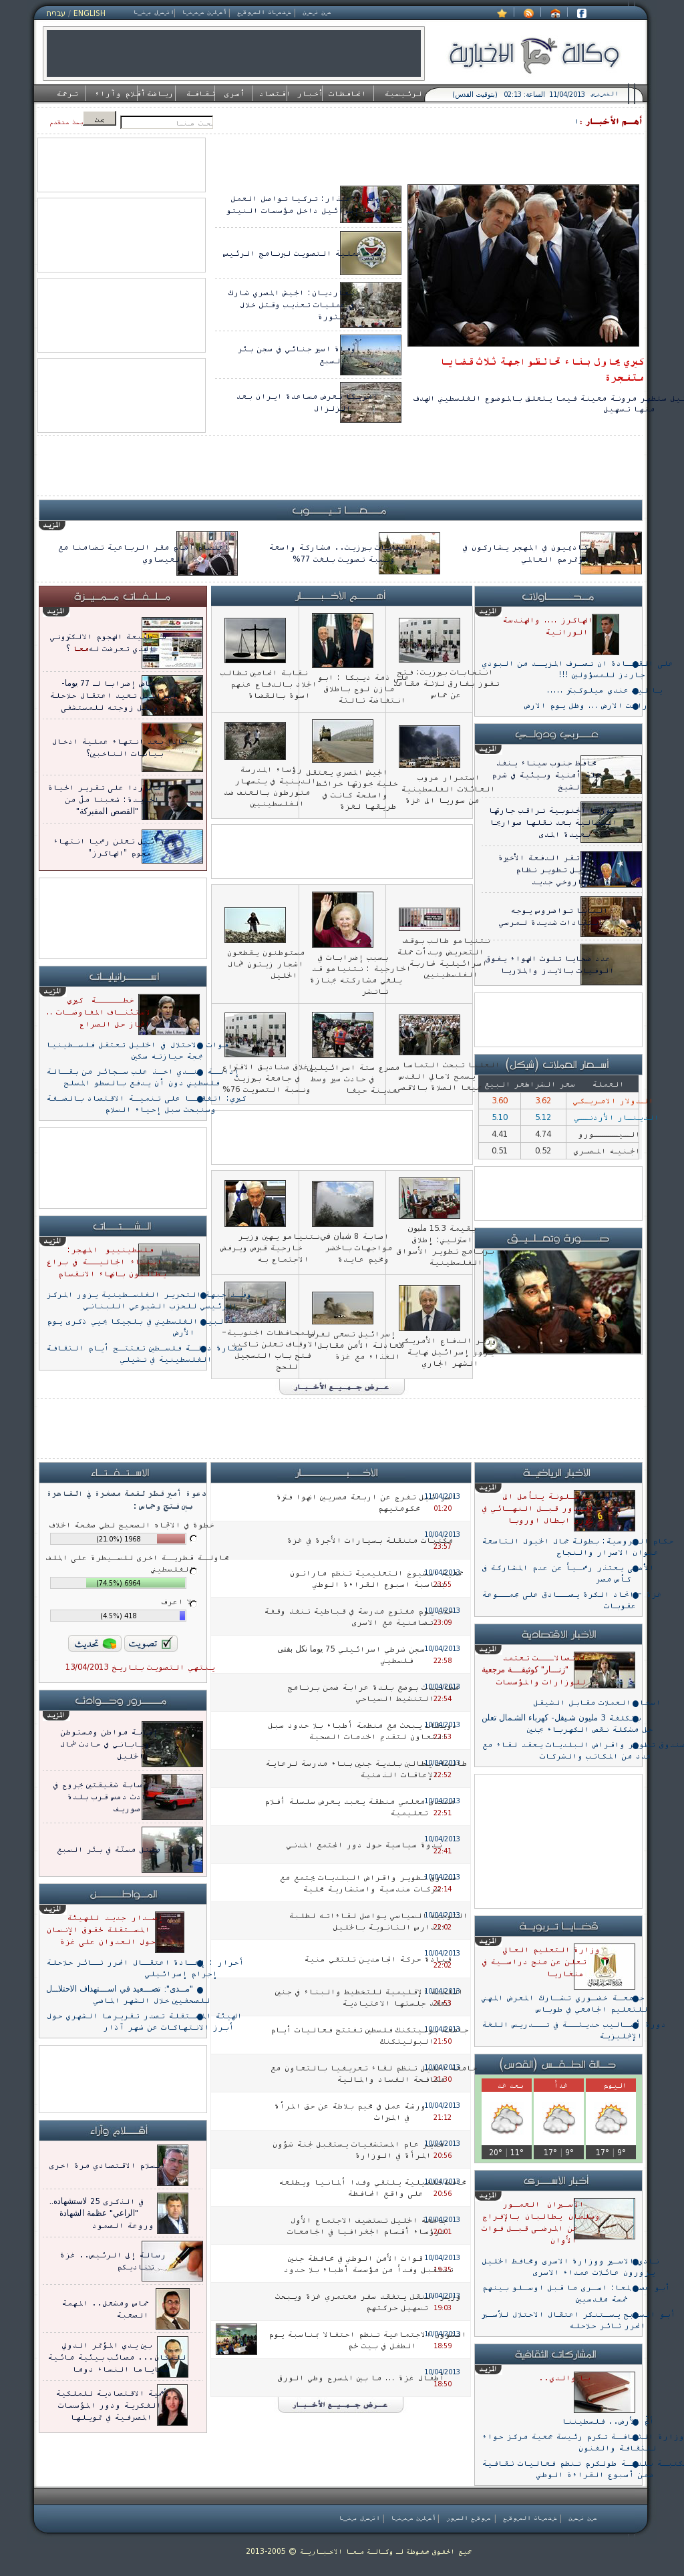 Ma'an News at Wednesday April 10, 2013, 11:13 p.m. UTC